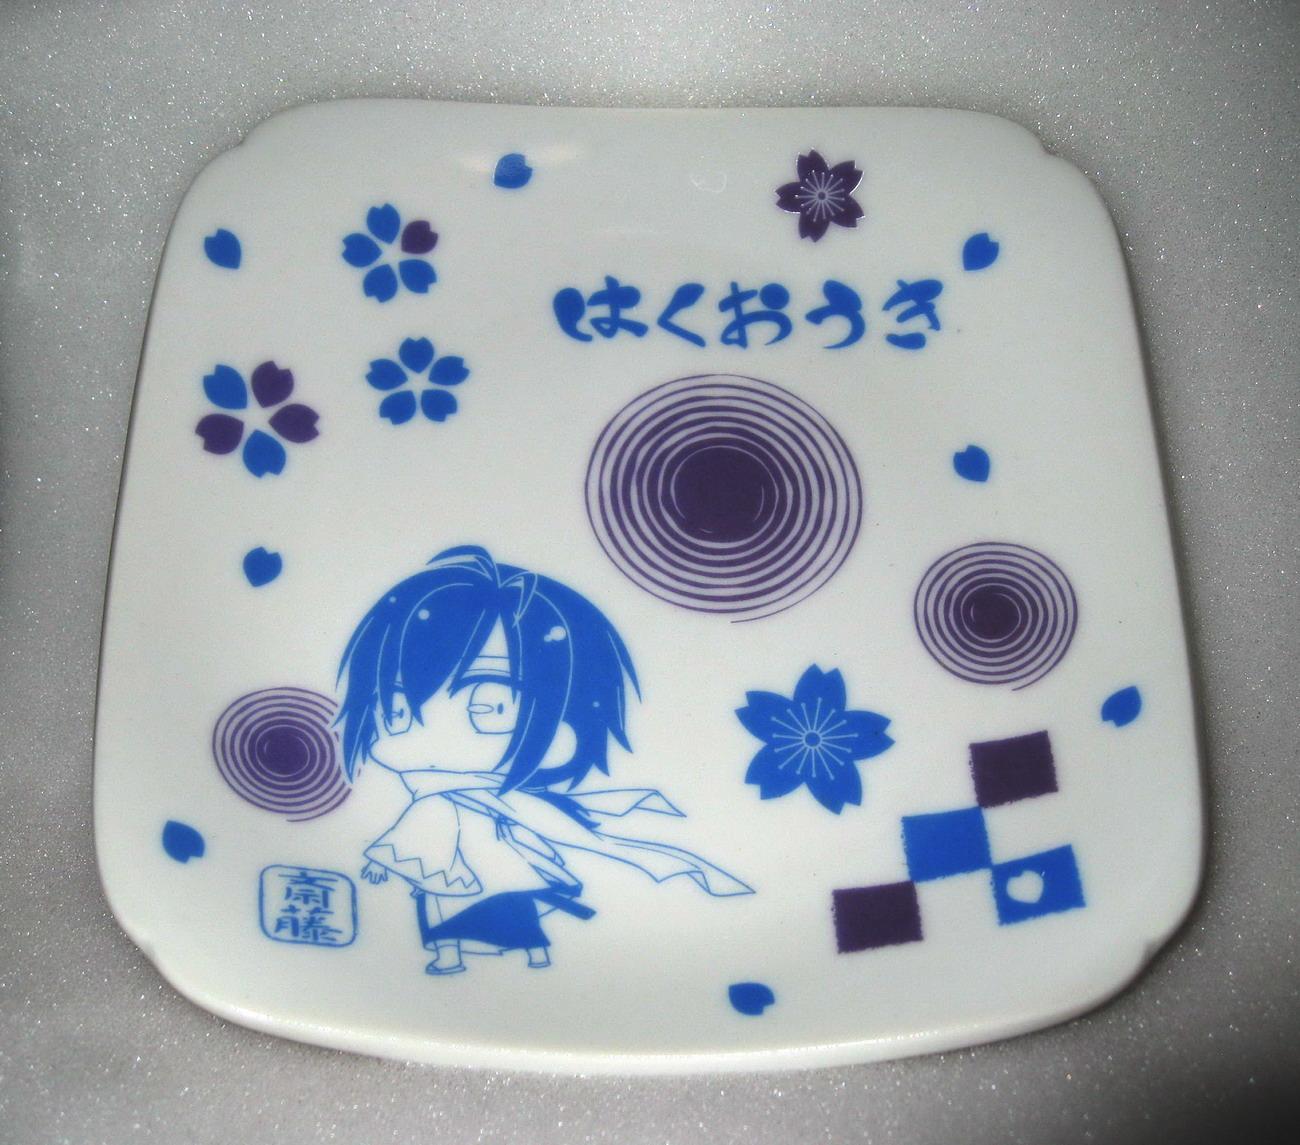 Sakura banquet plate - Saito